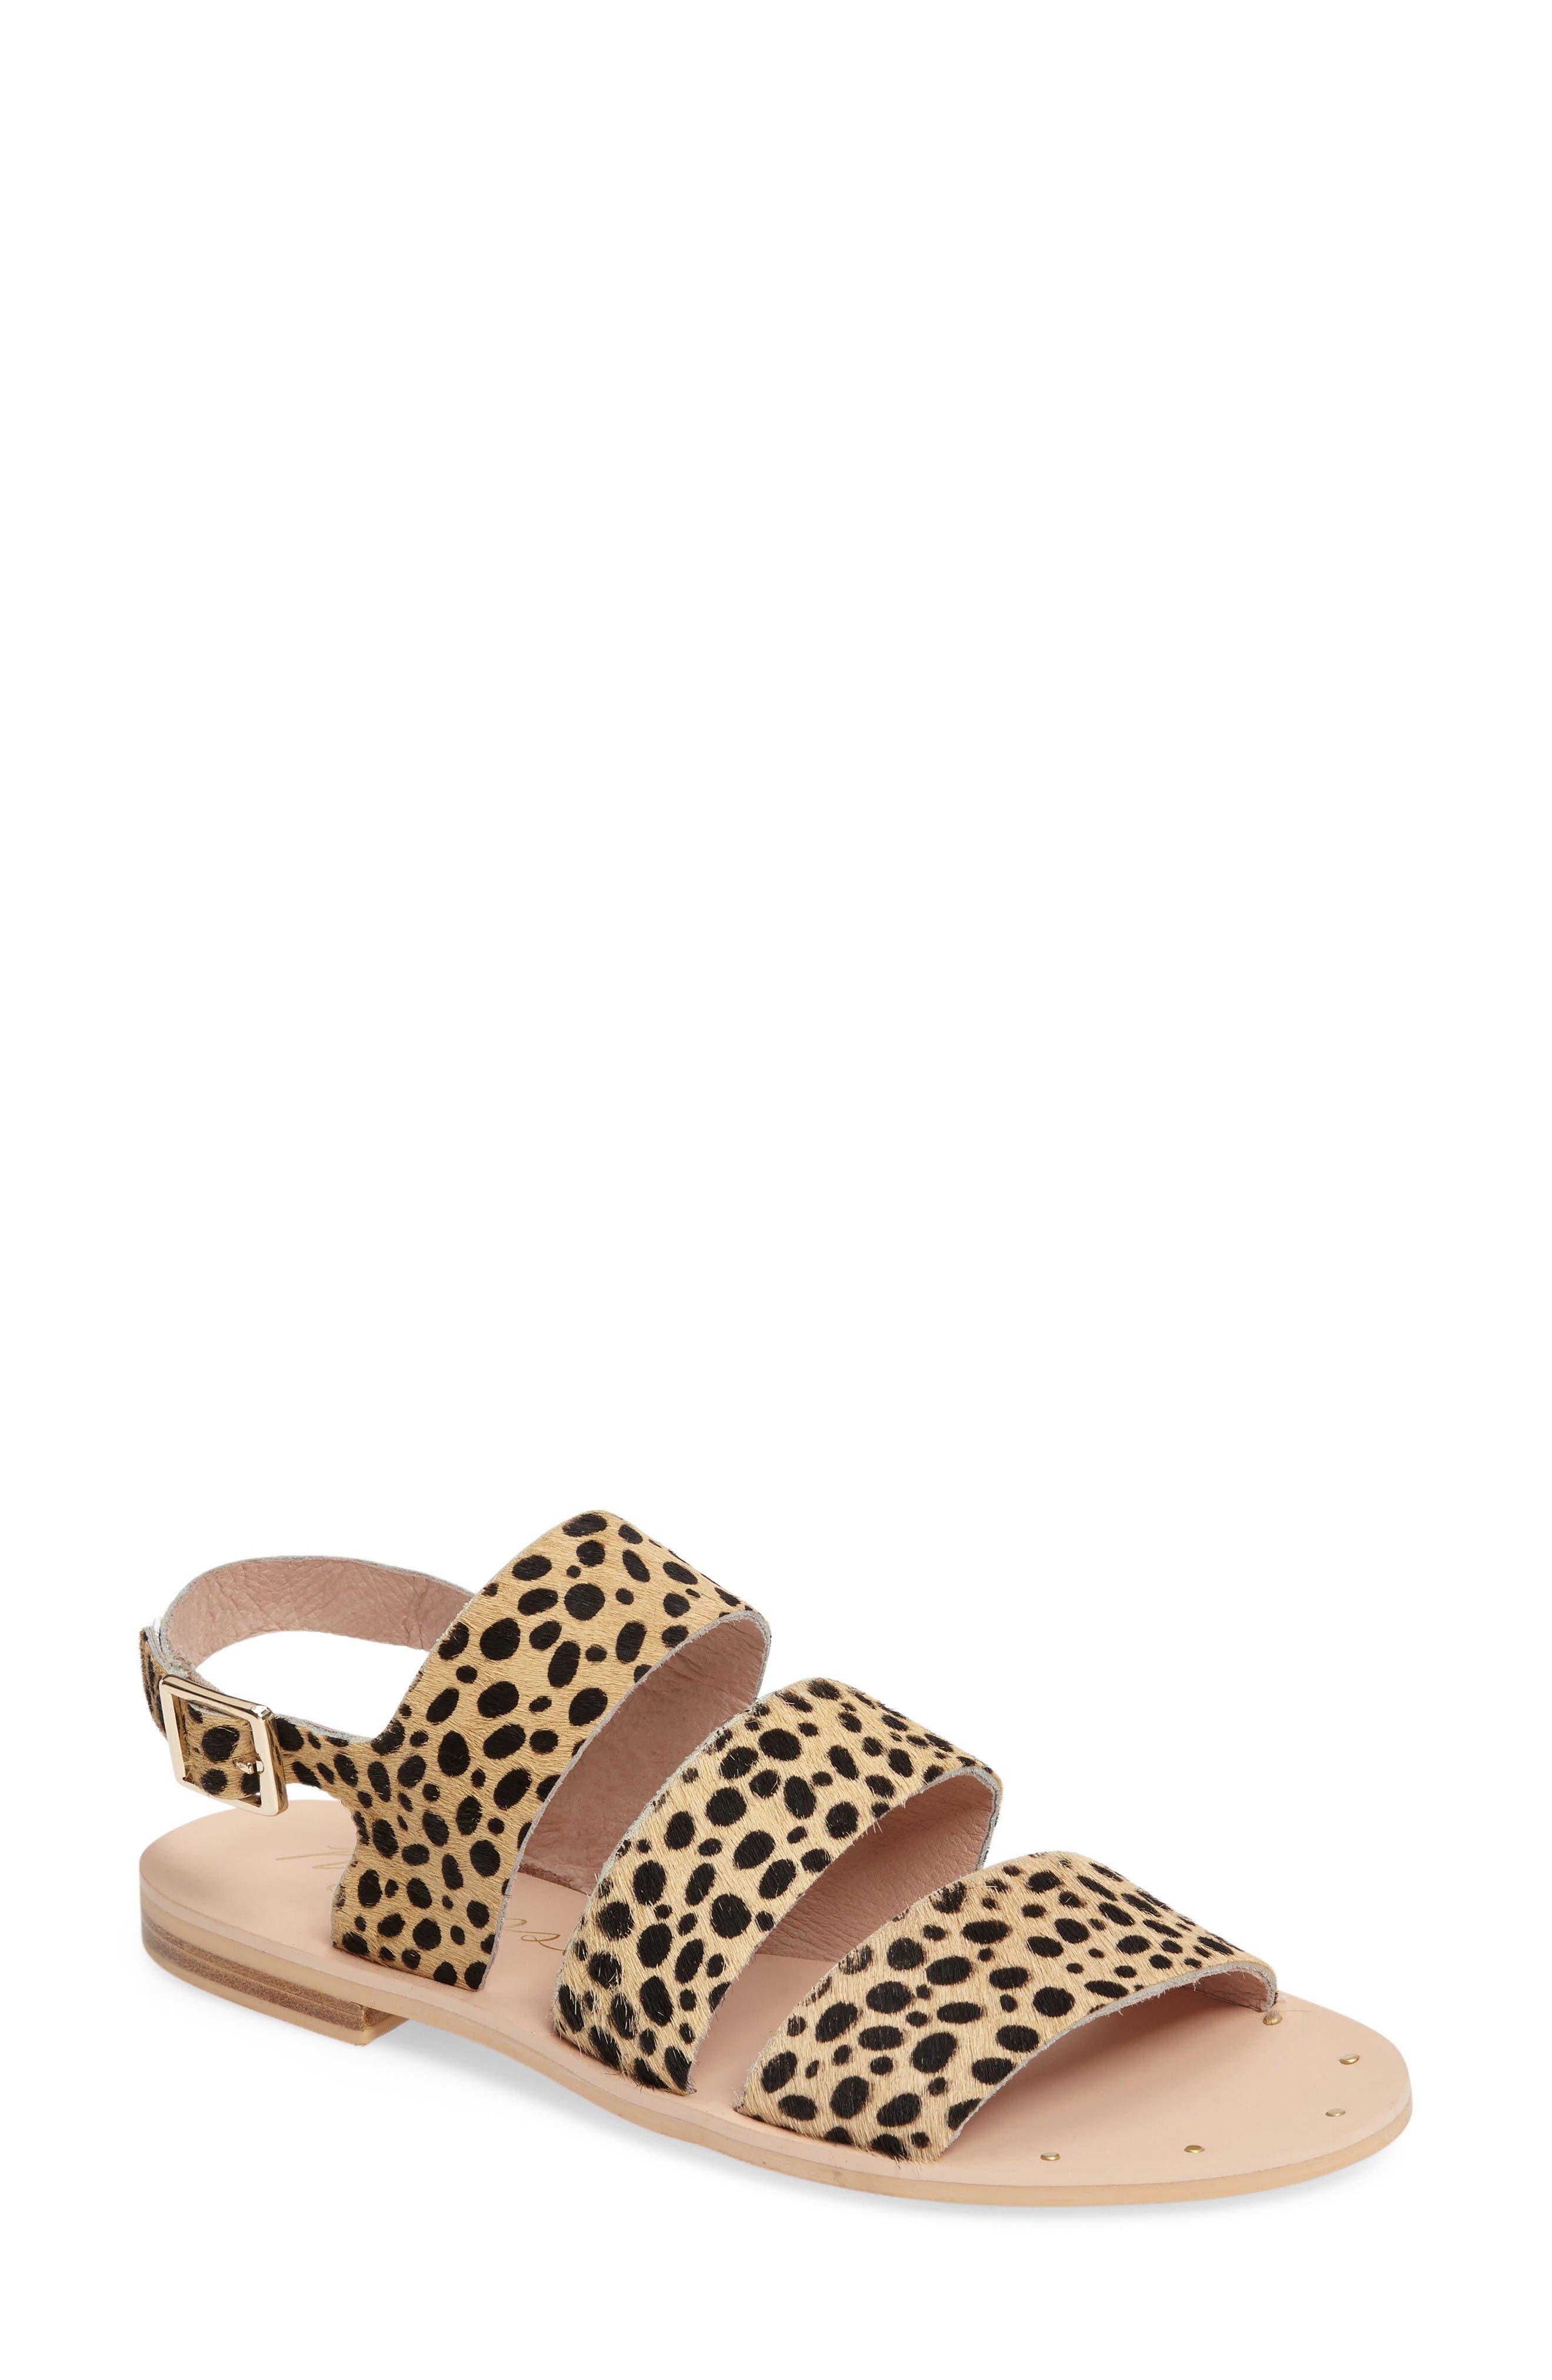 Matisse Owen Genuine Calf Hair Sandal (Women)